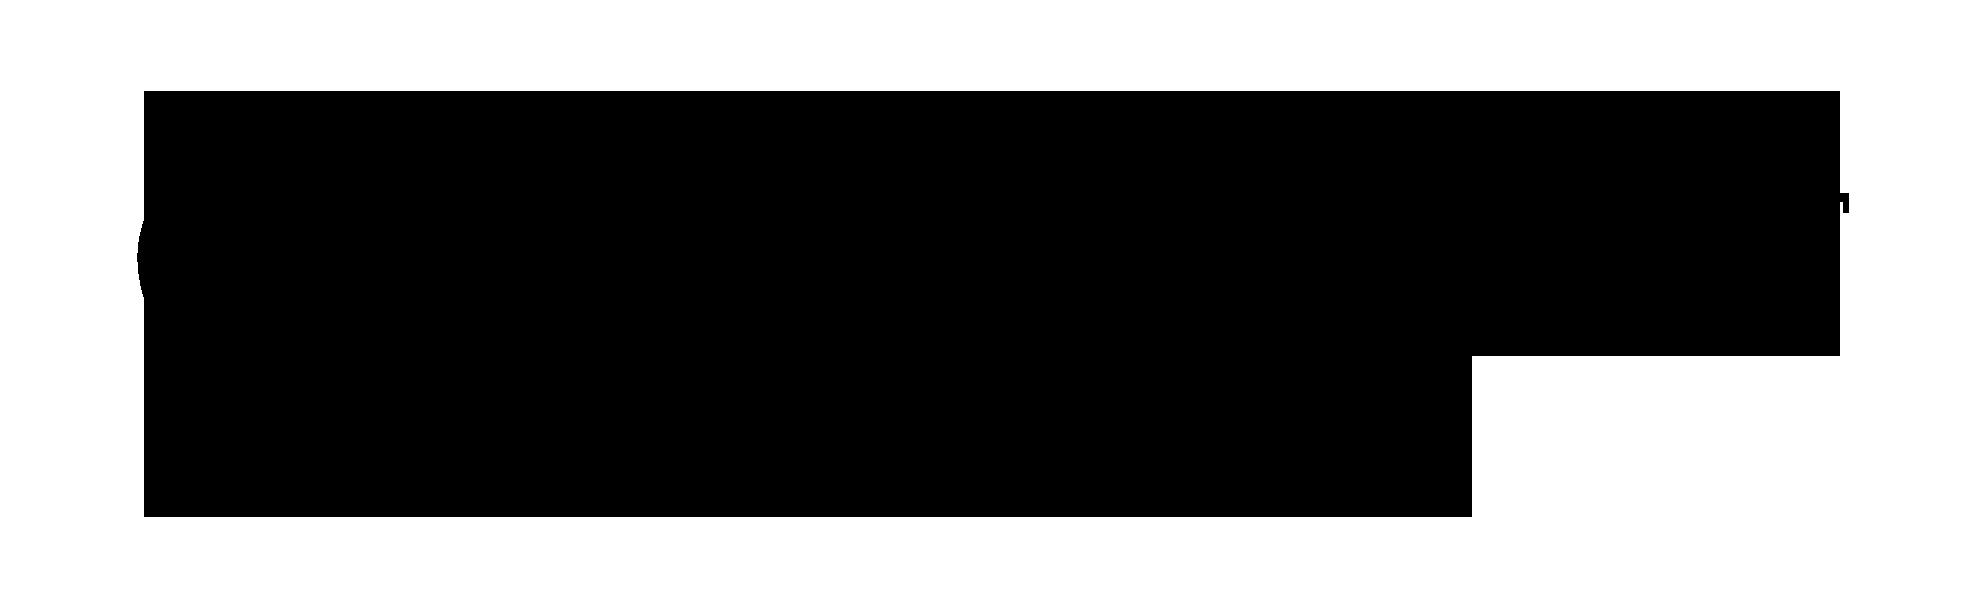 GvBs_logo_H.png